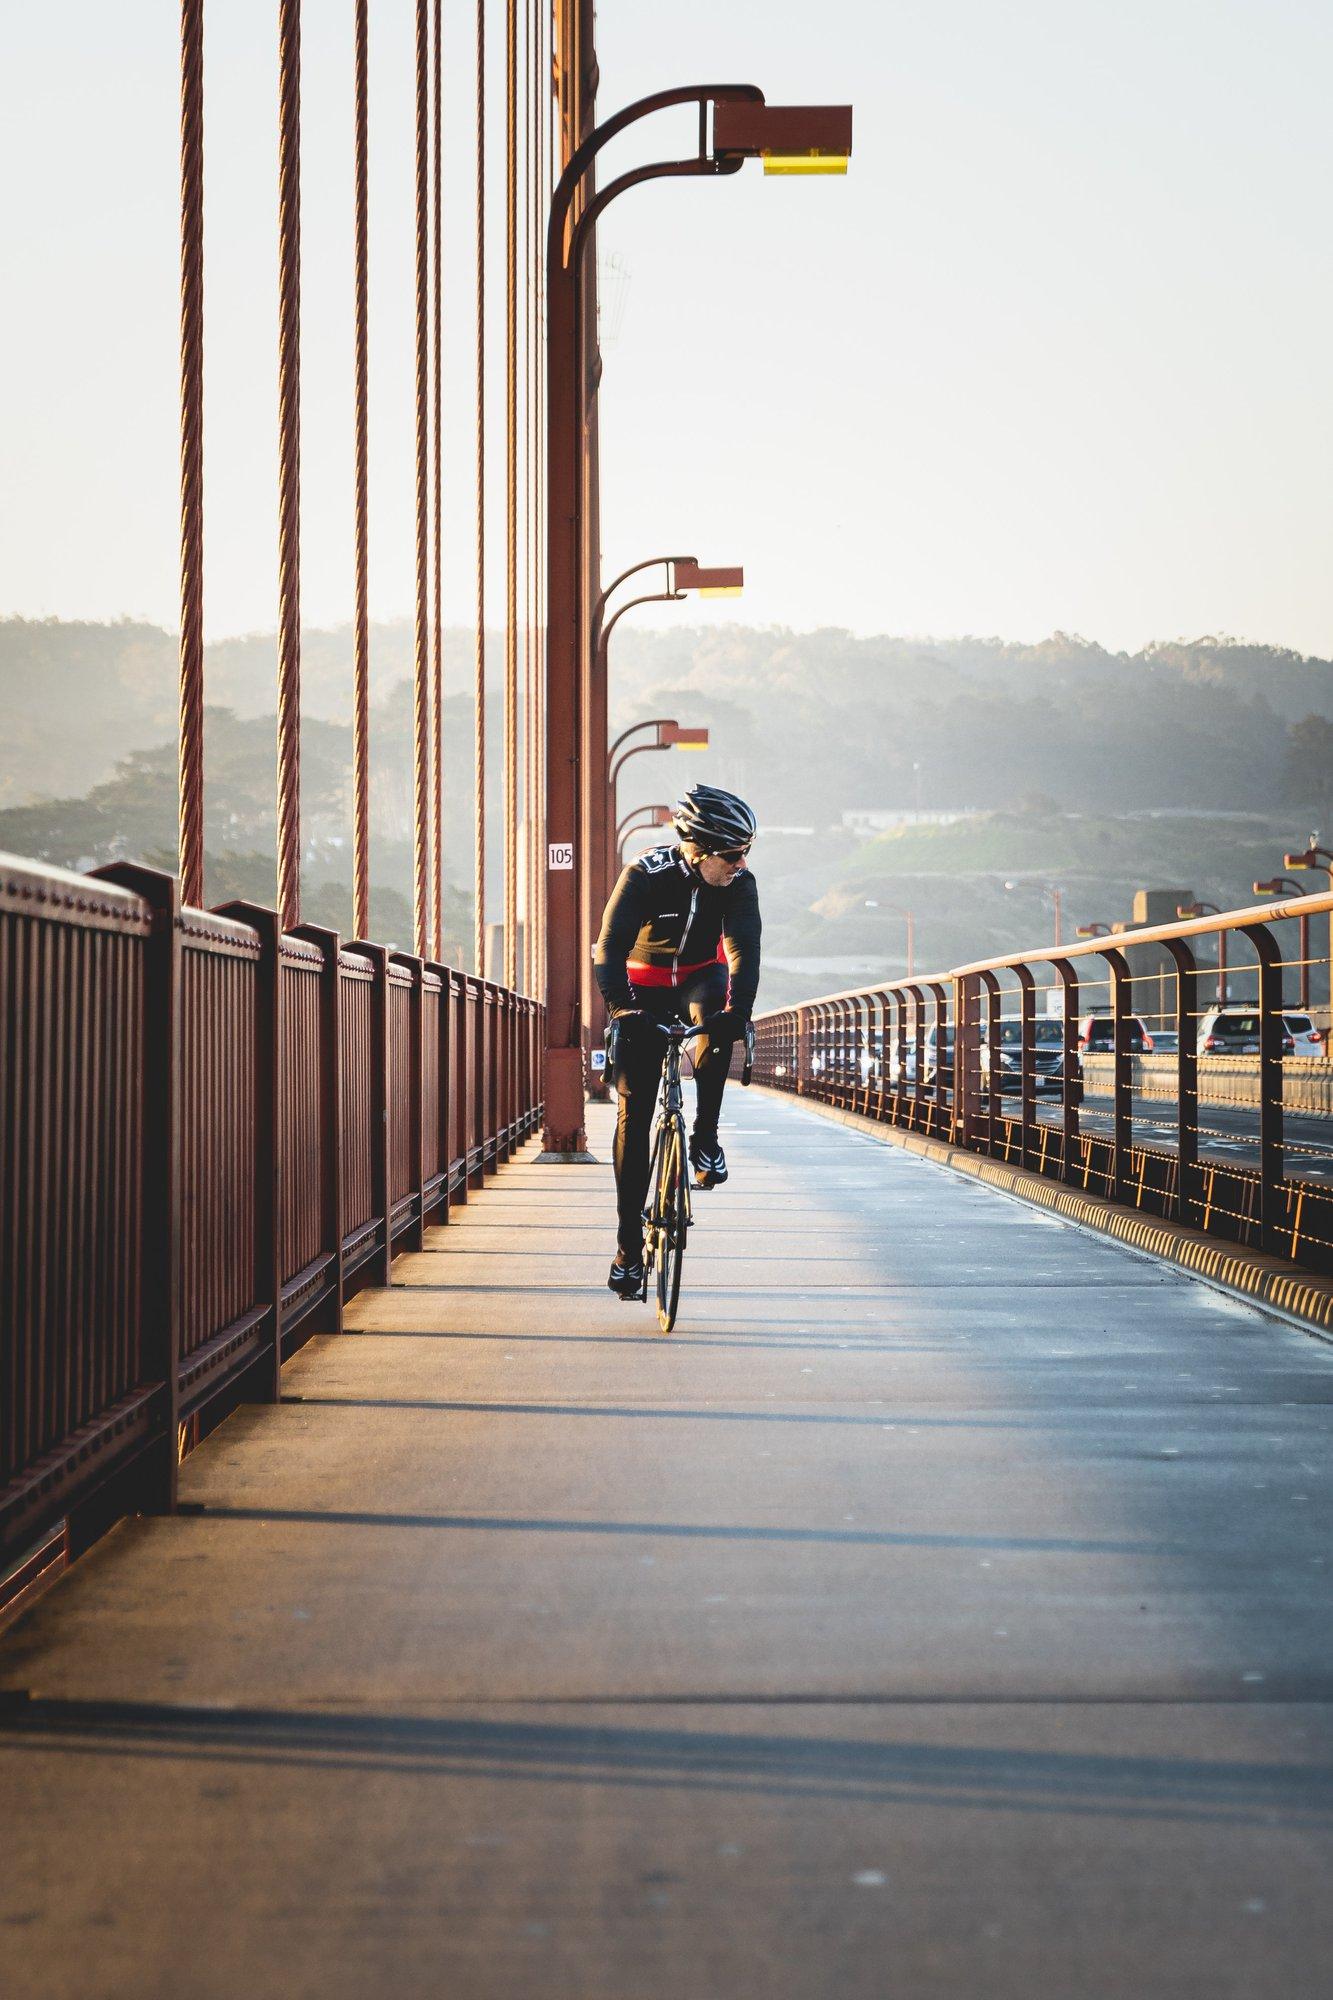 man-riding-a-bicycle-on-bridge-3722760.jpg